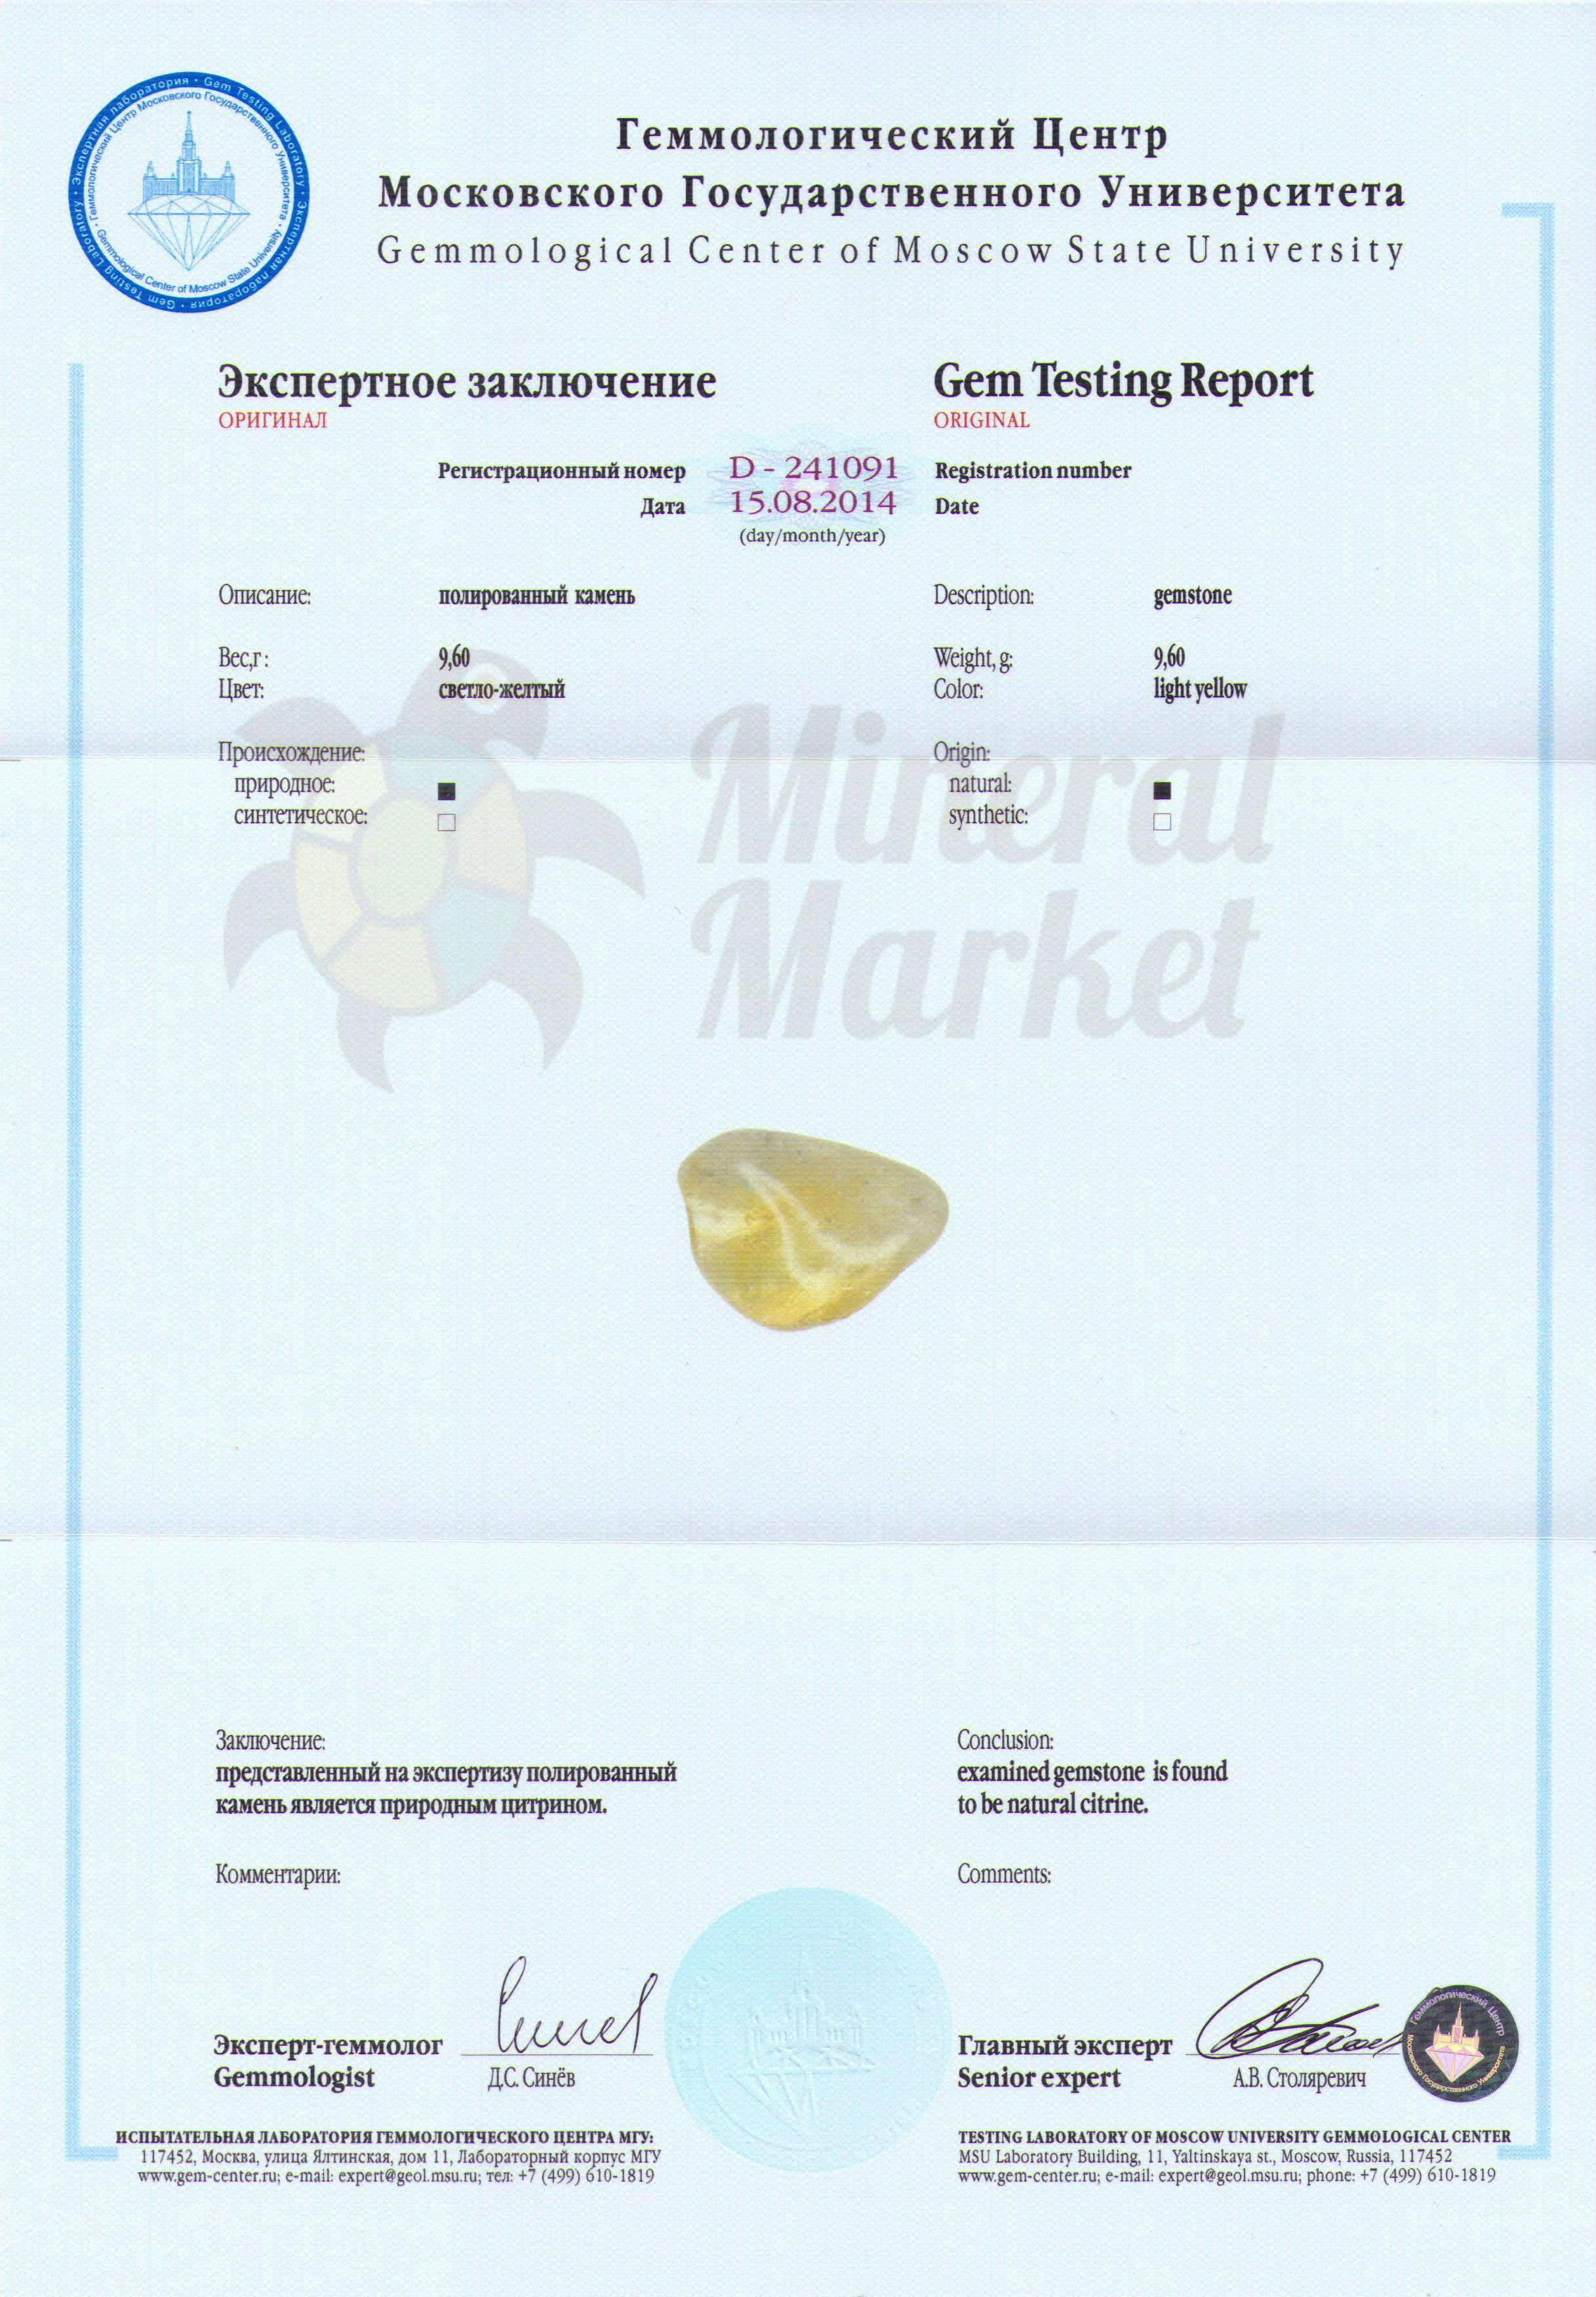 http://mineralmarket.ru/img/certificate/140.jpg